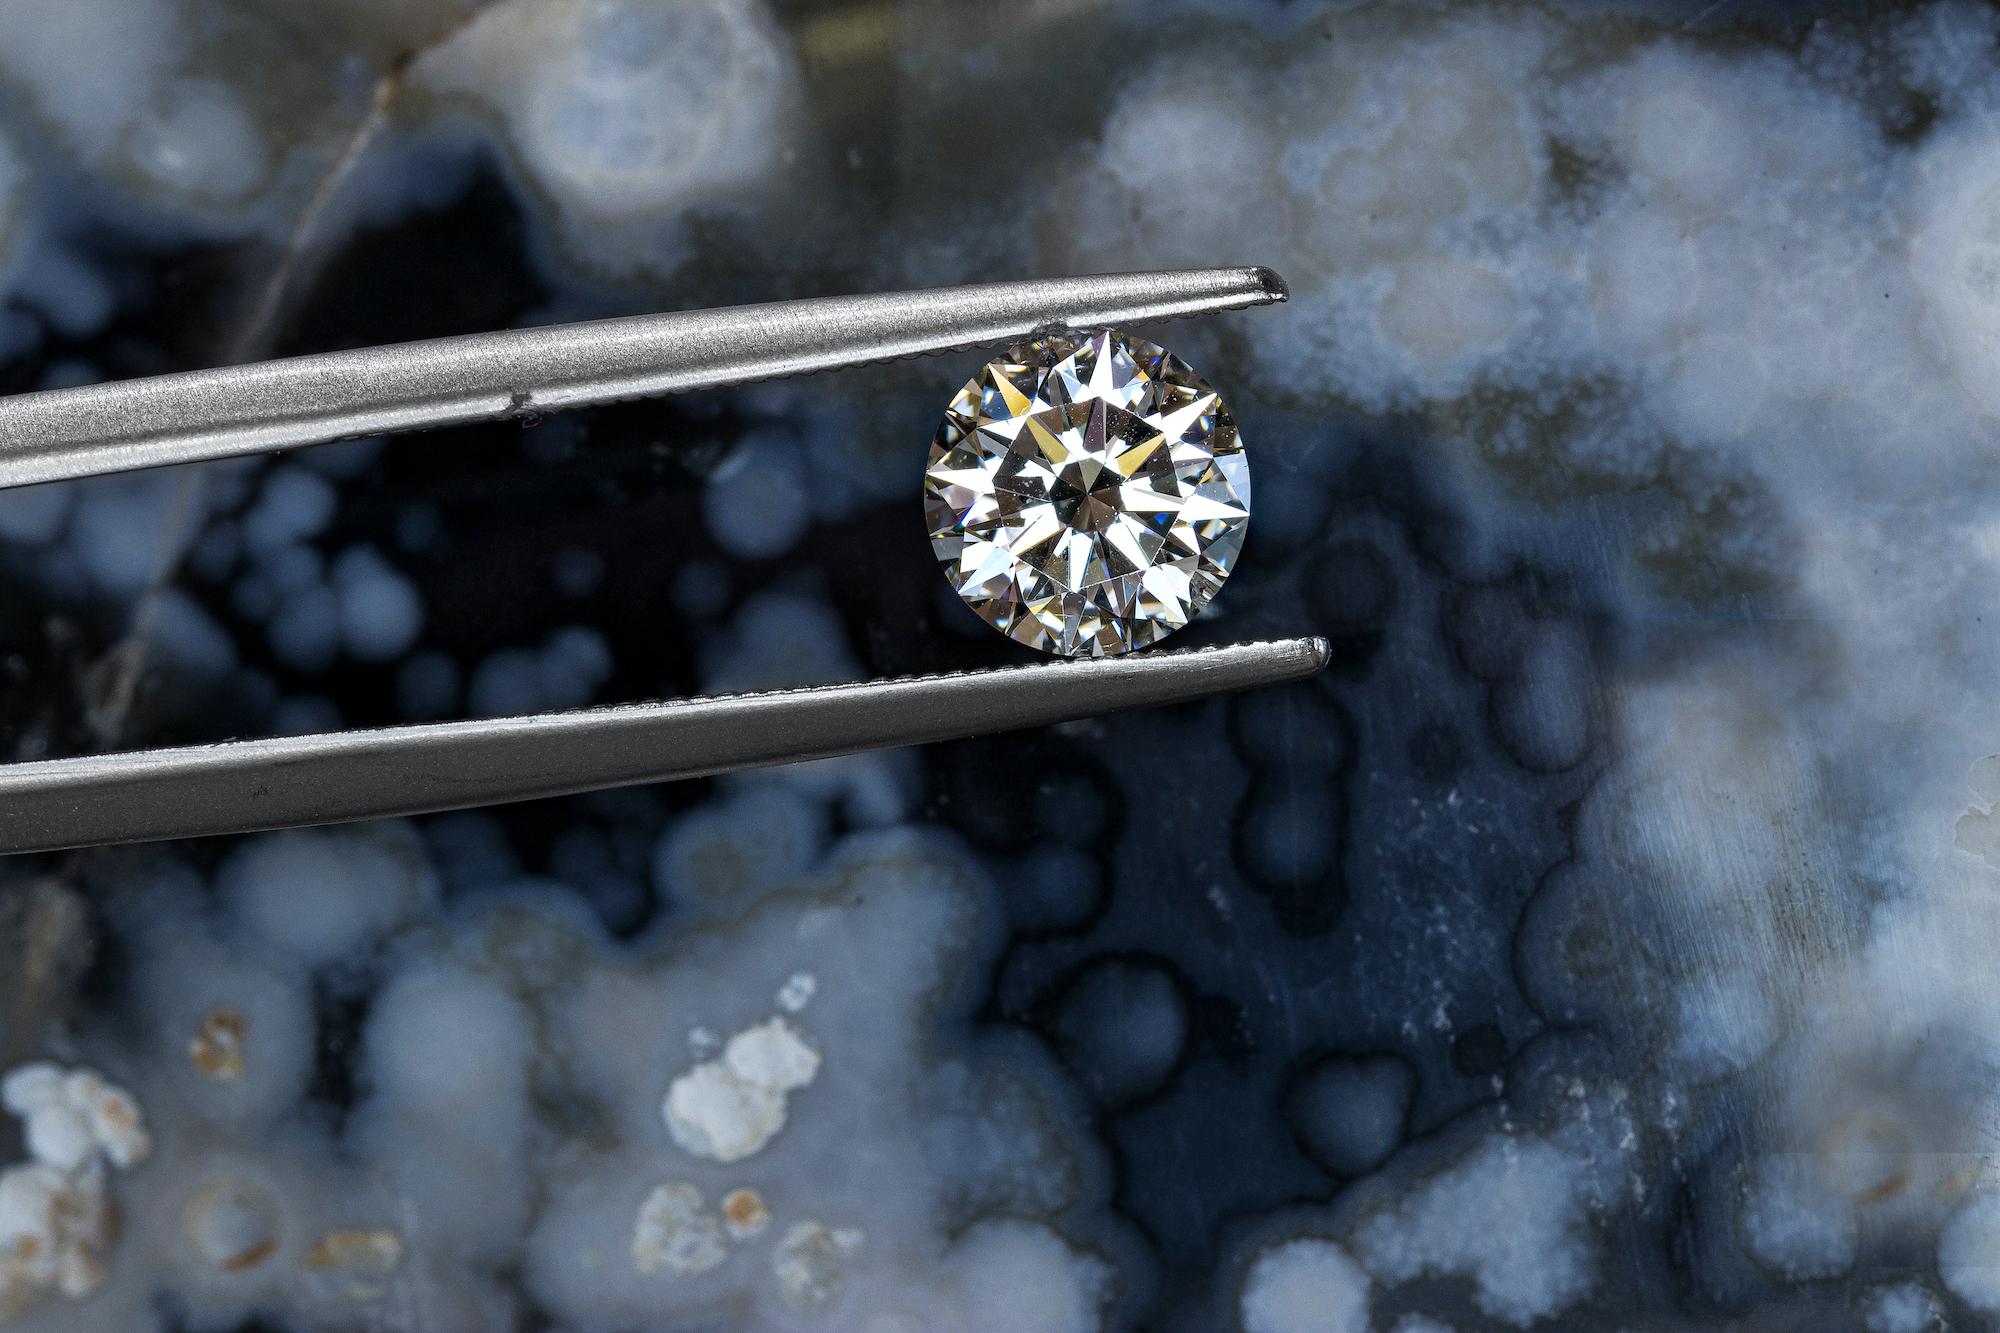 round diamond being held by a pair of tweezers